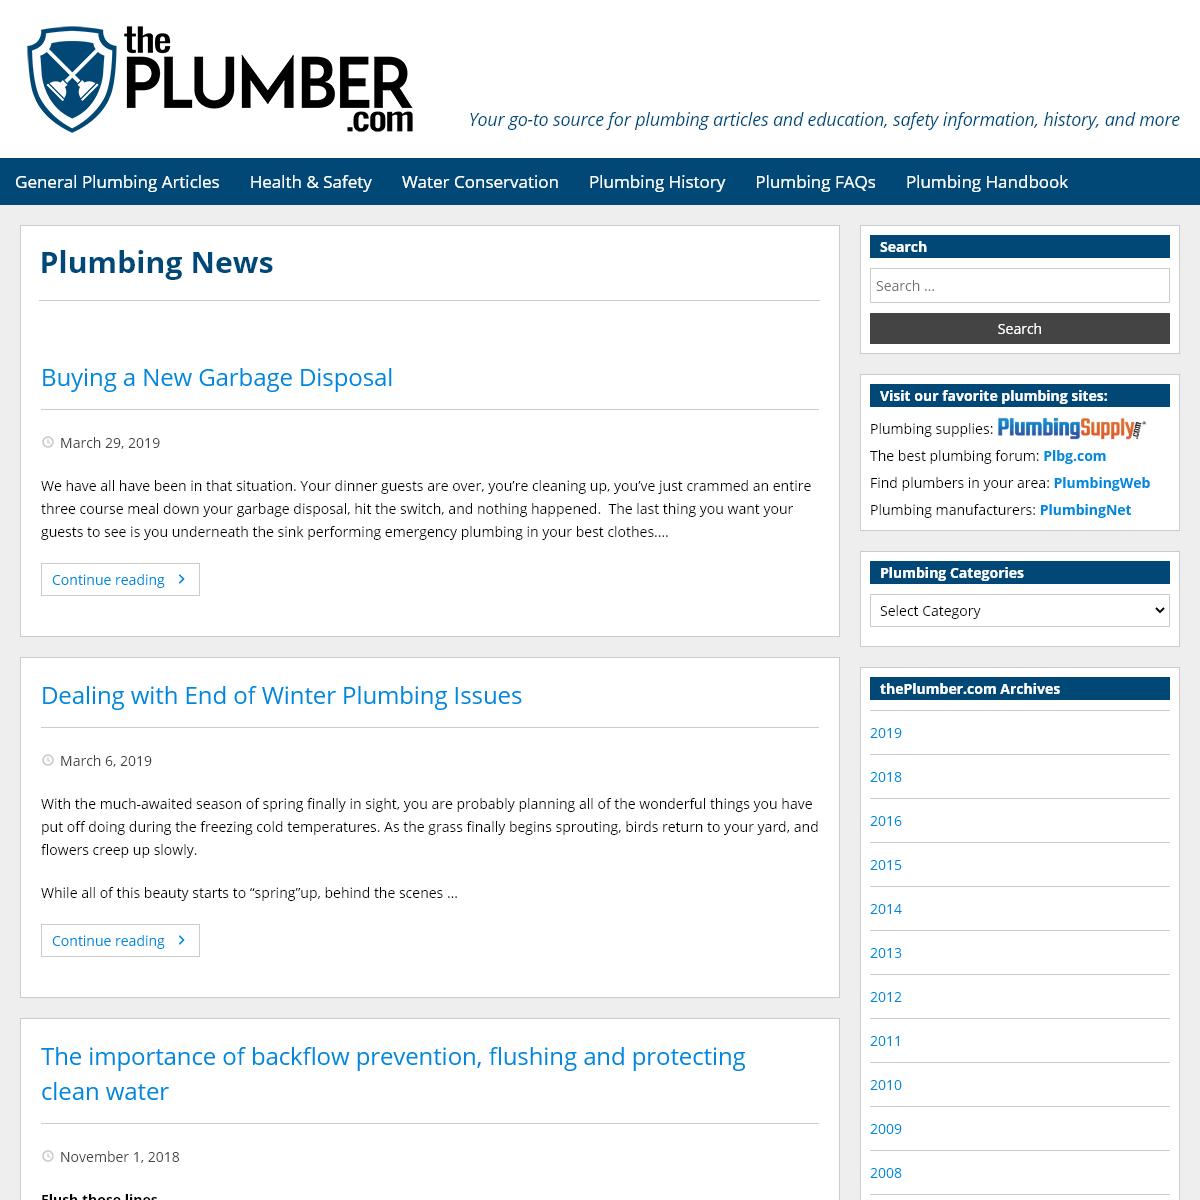 thePlumber.com- Plumbing information, history, & more